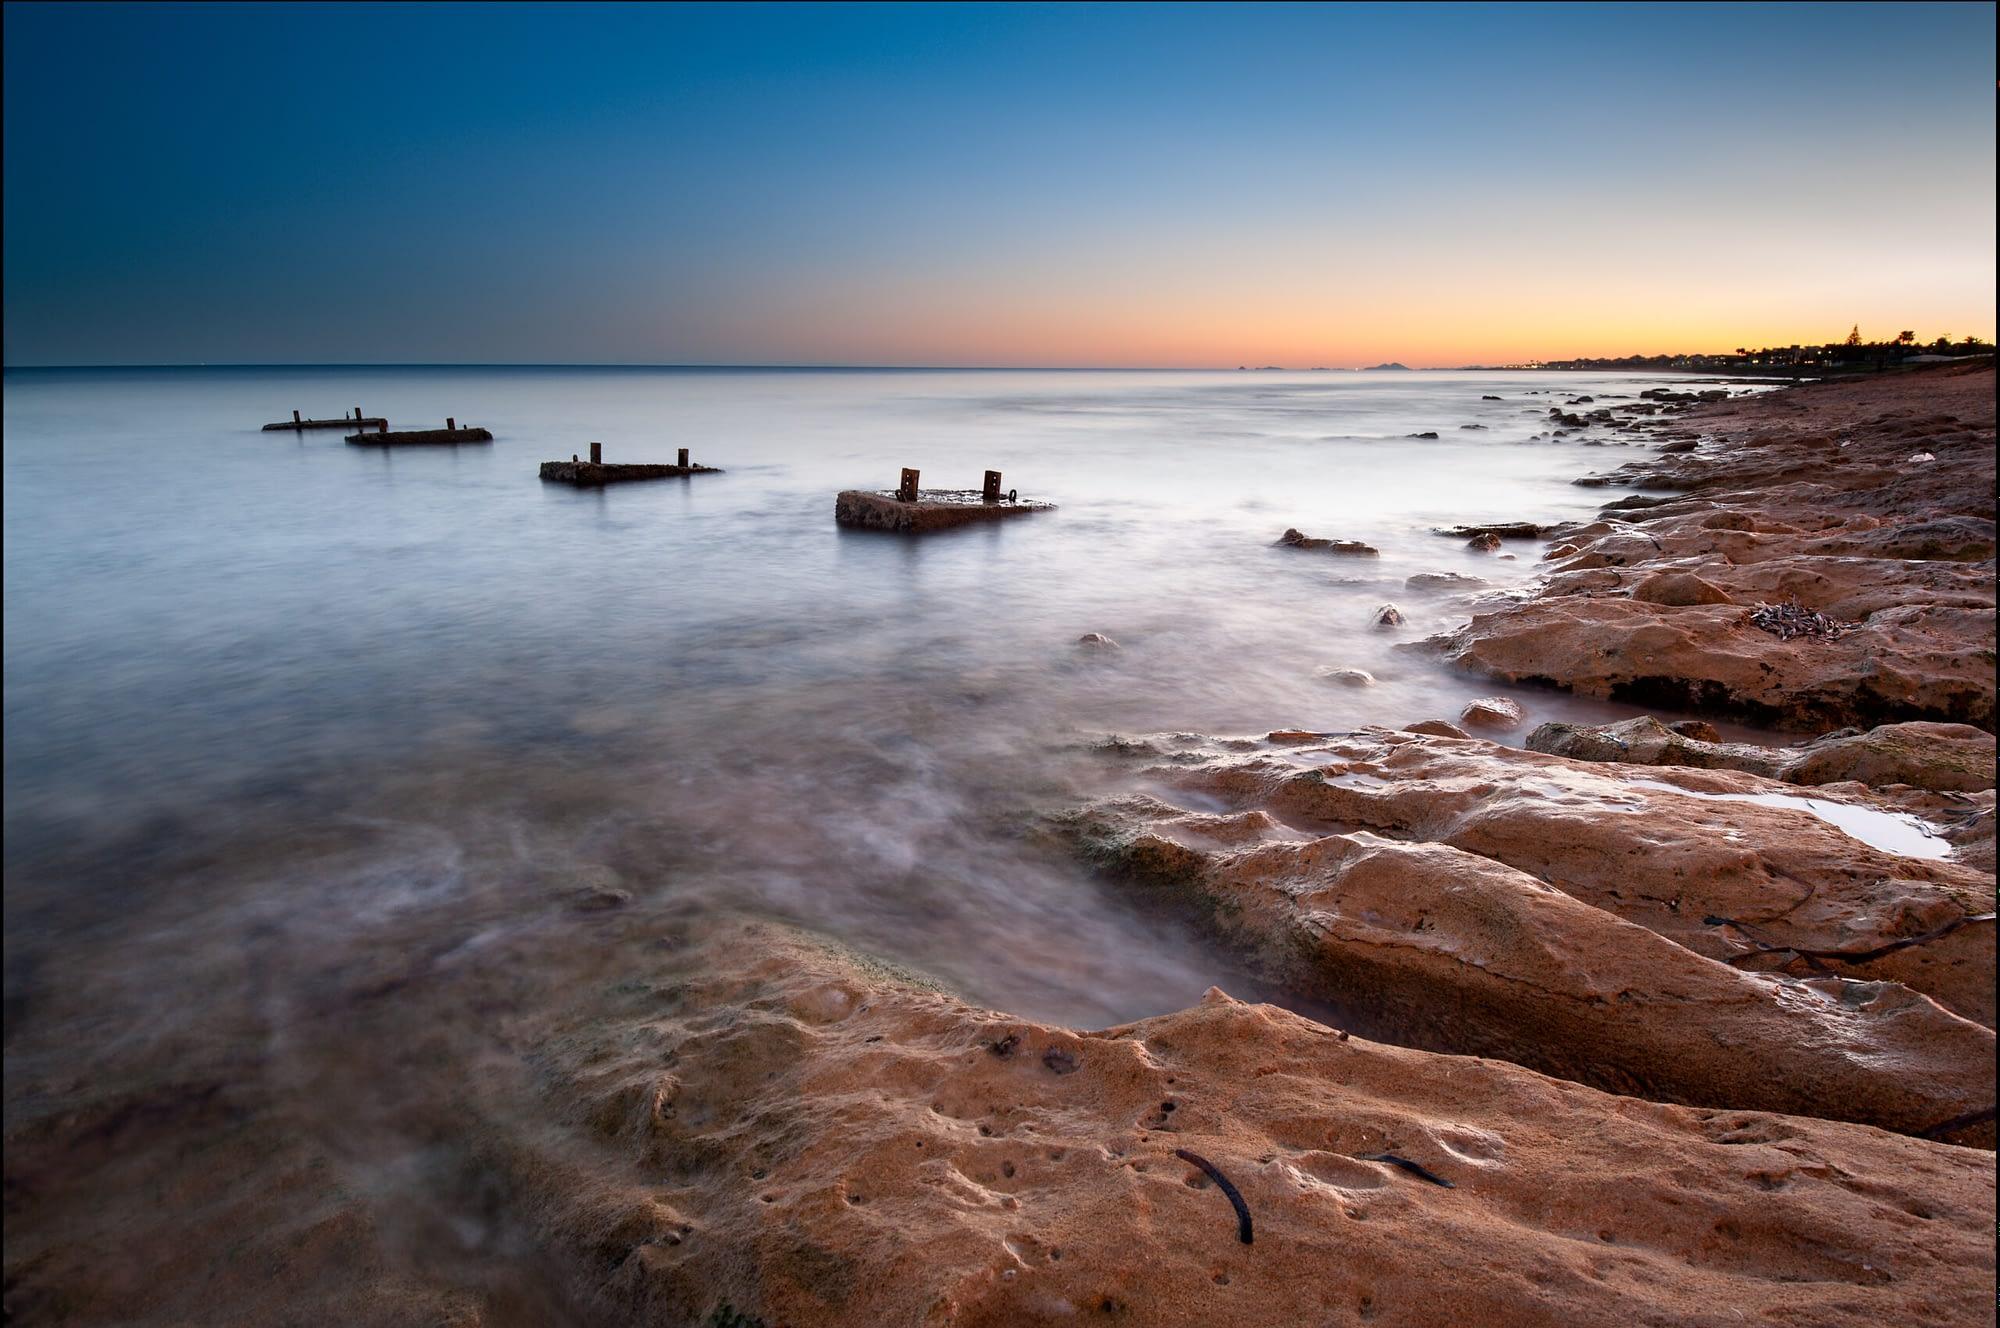 Costa de Torrevieja - Landscape Photography by Jose Luis Durante Molina